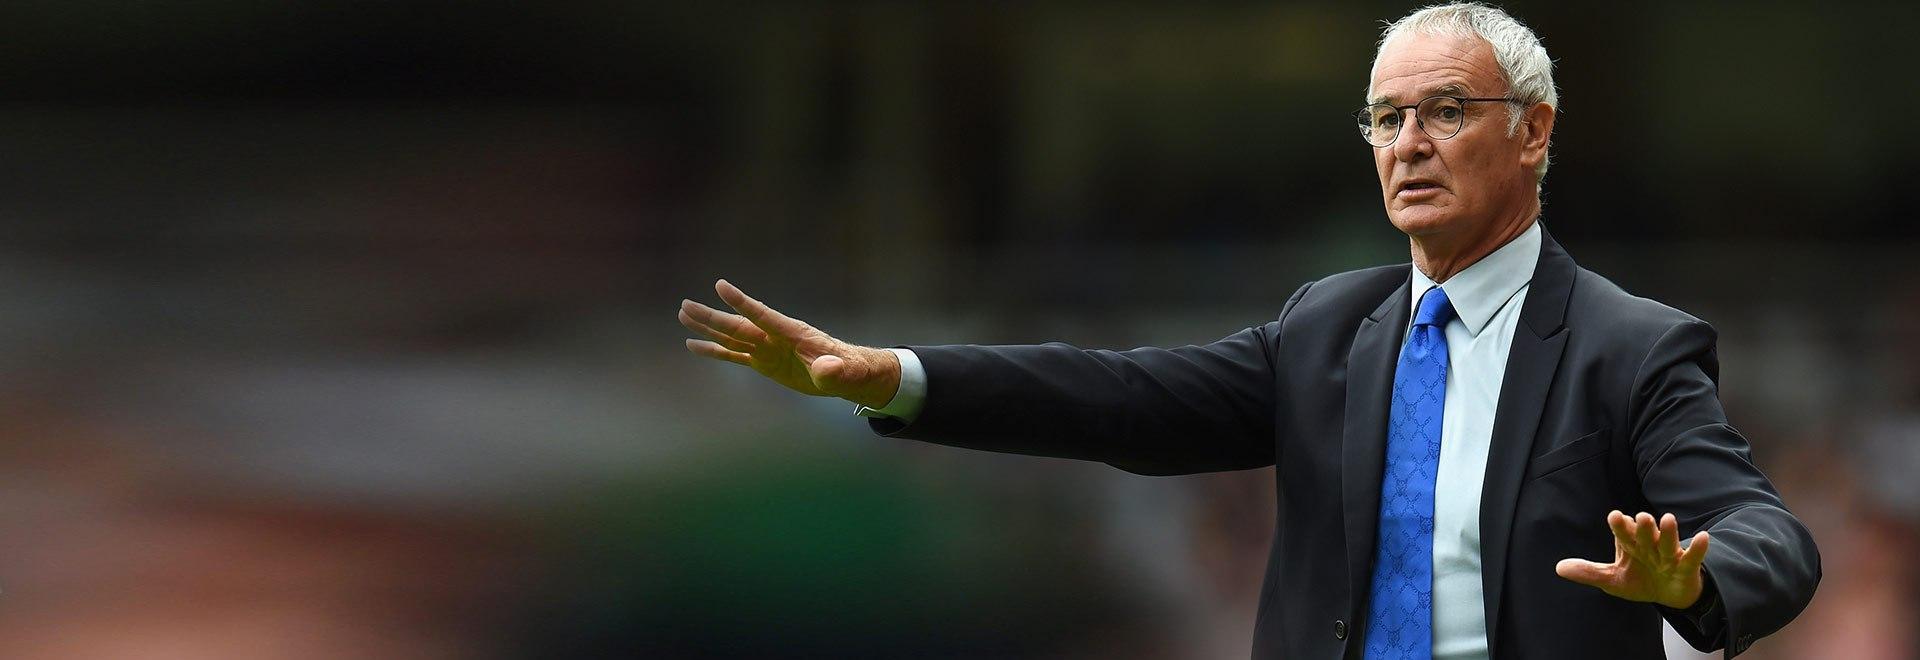 Premier League The Boss: Claudio Ranieri